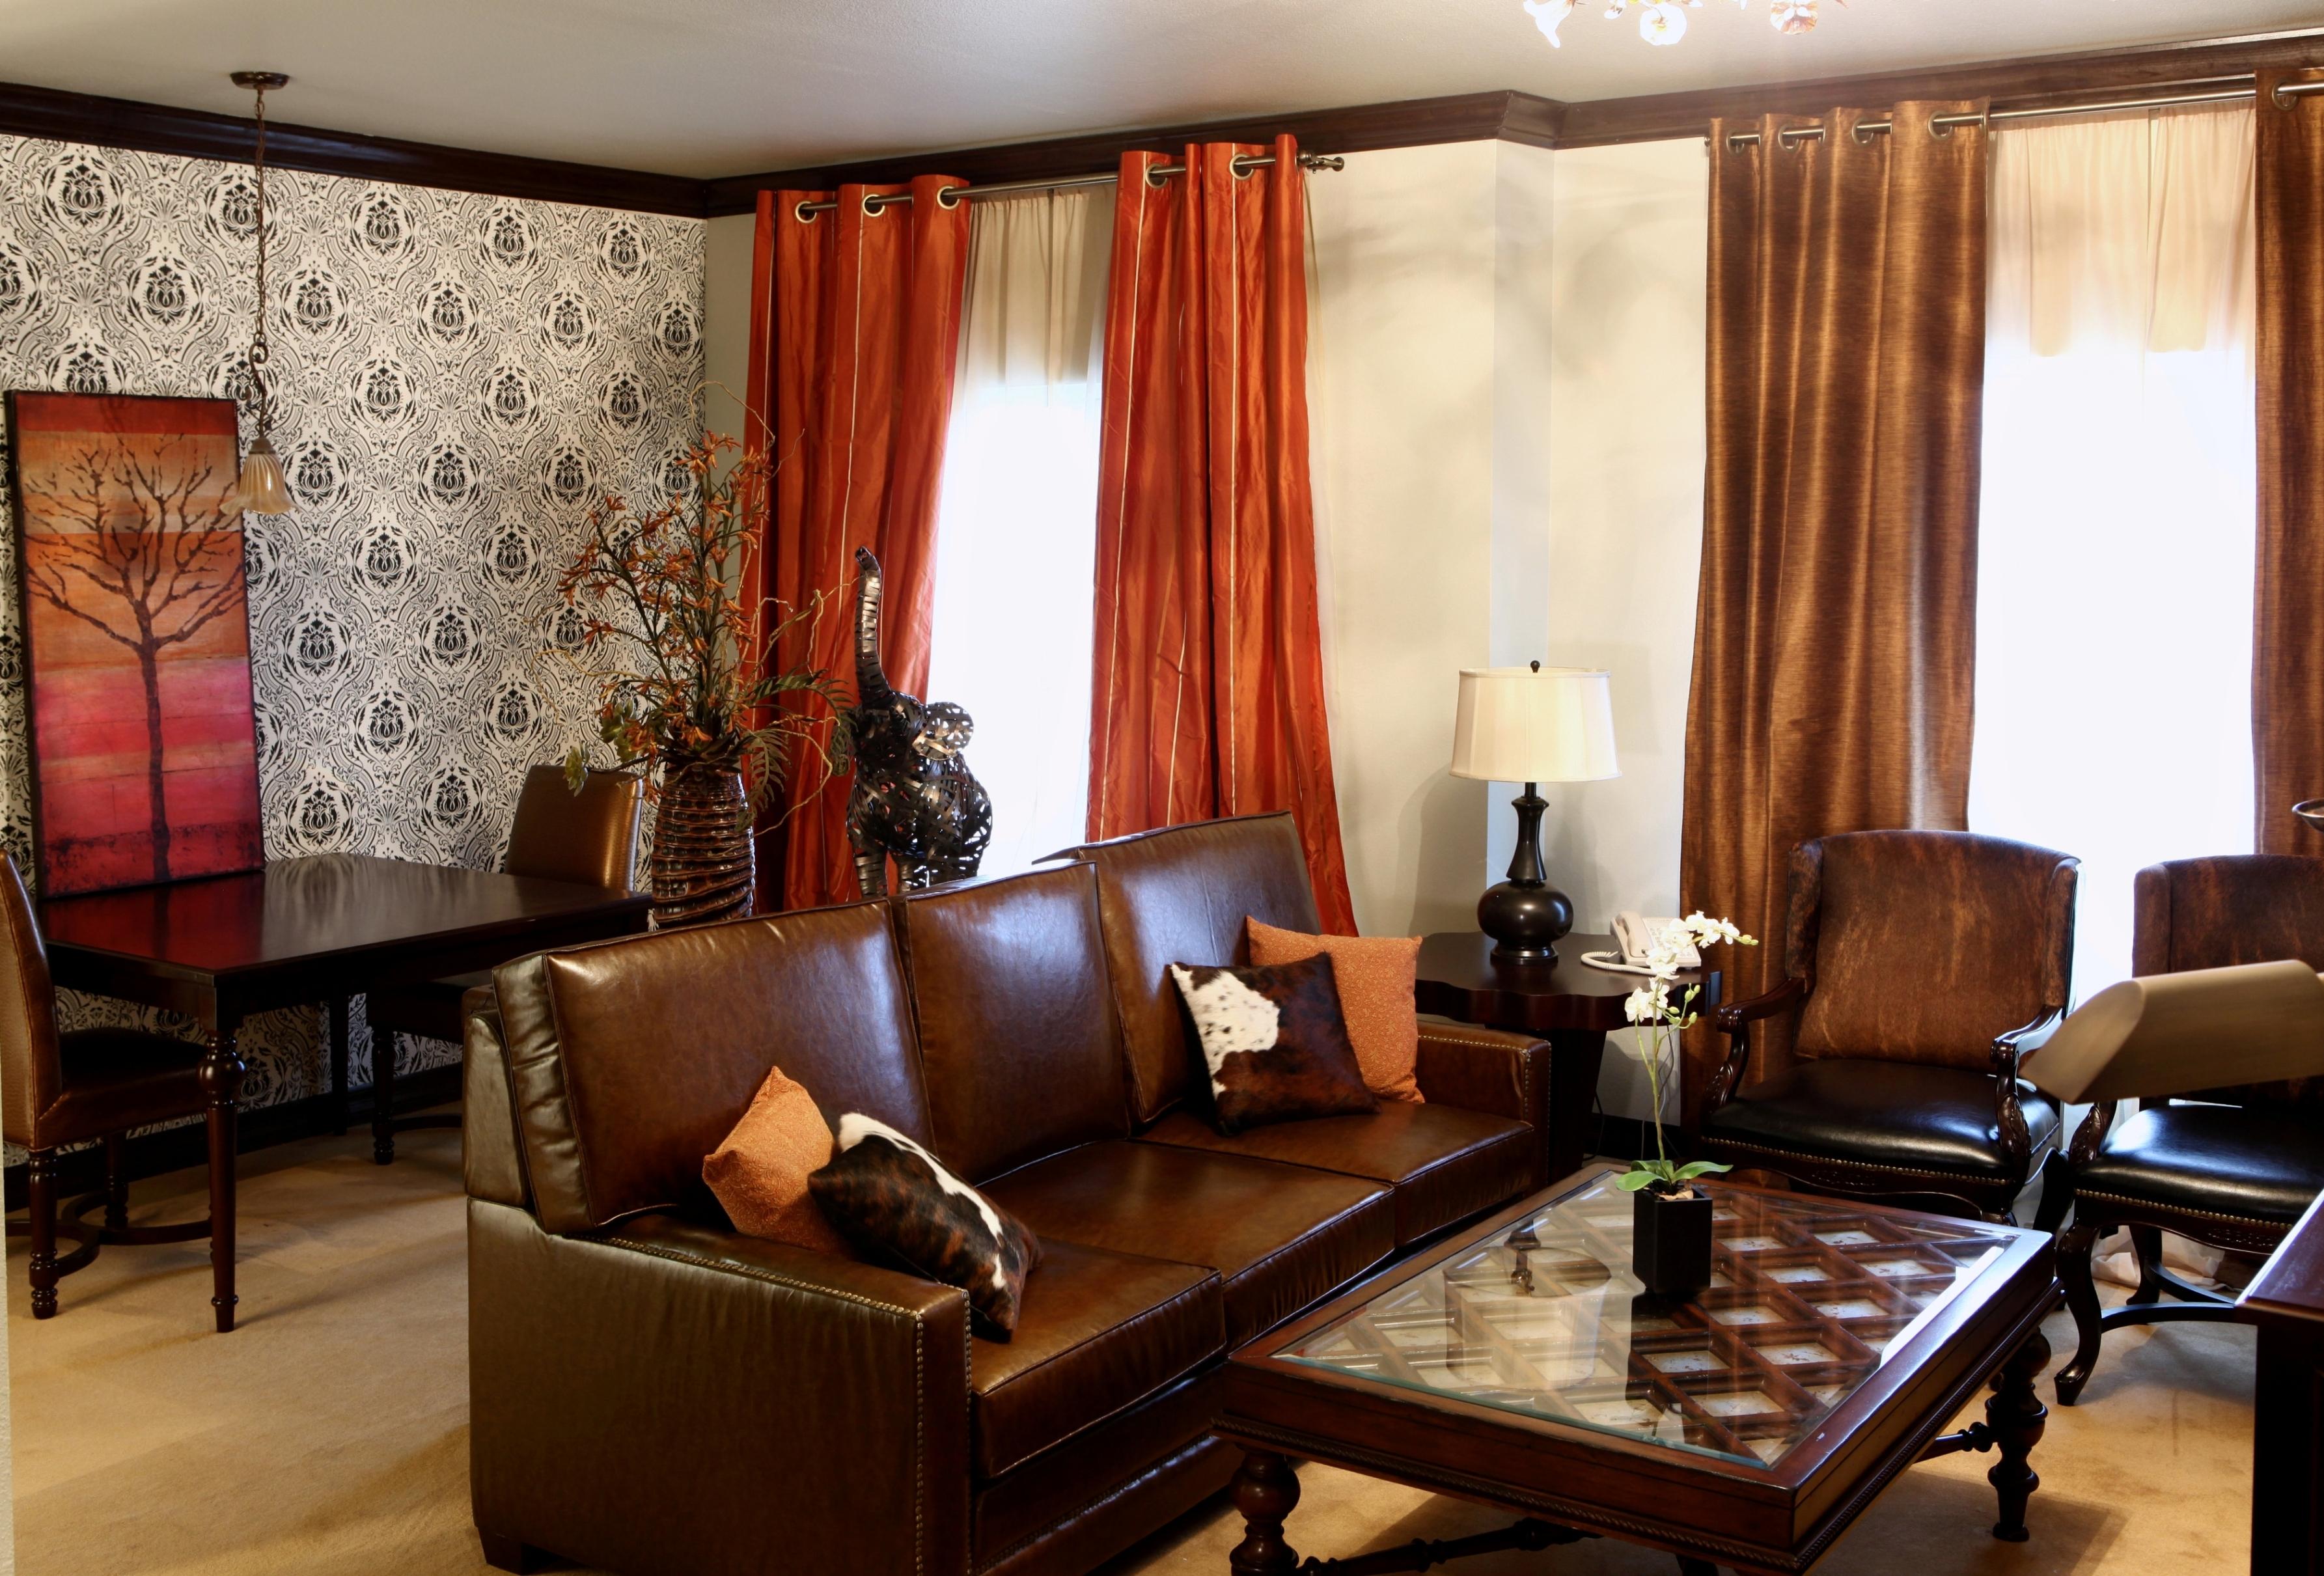 Hawthorn Suites by Wyndham Lubbock image 9